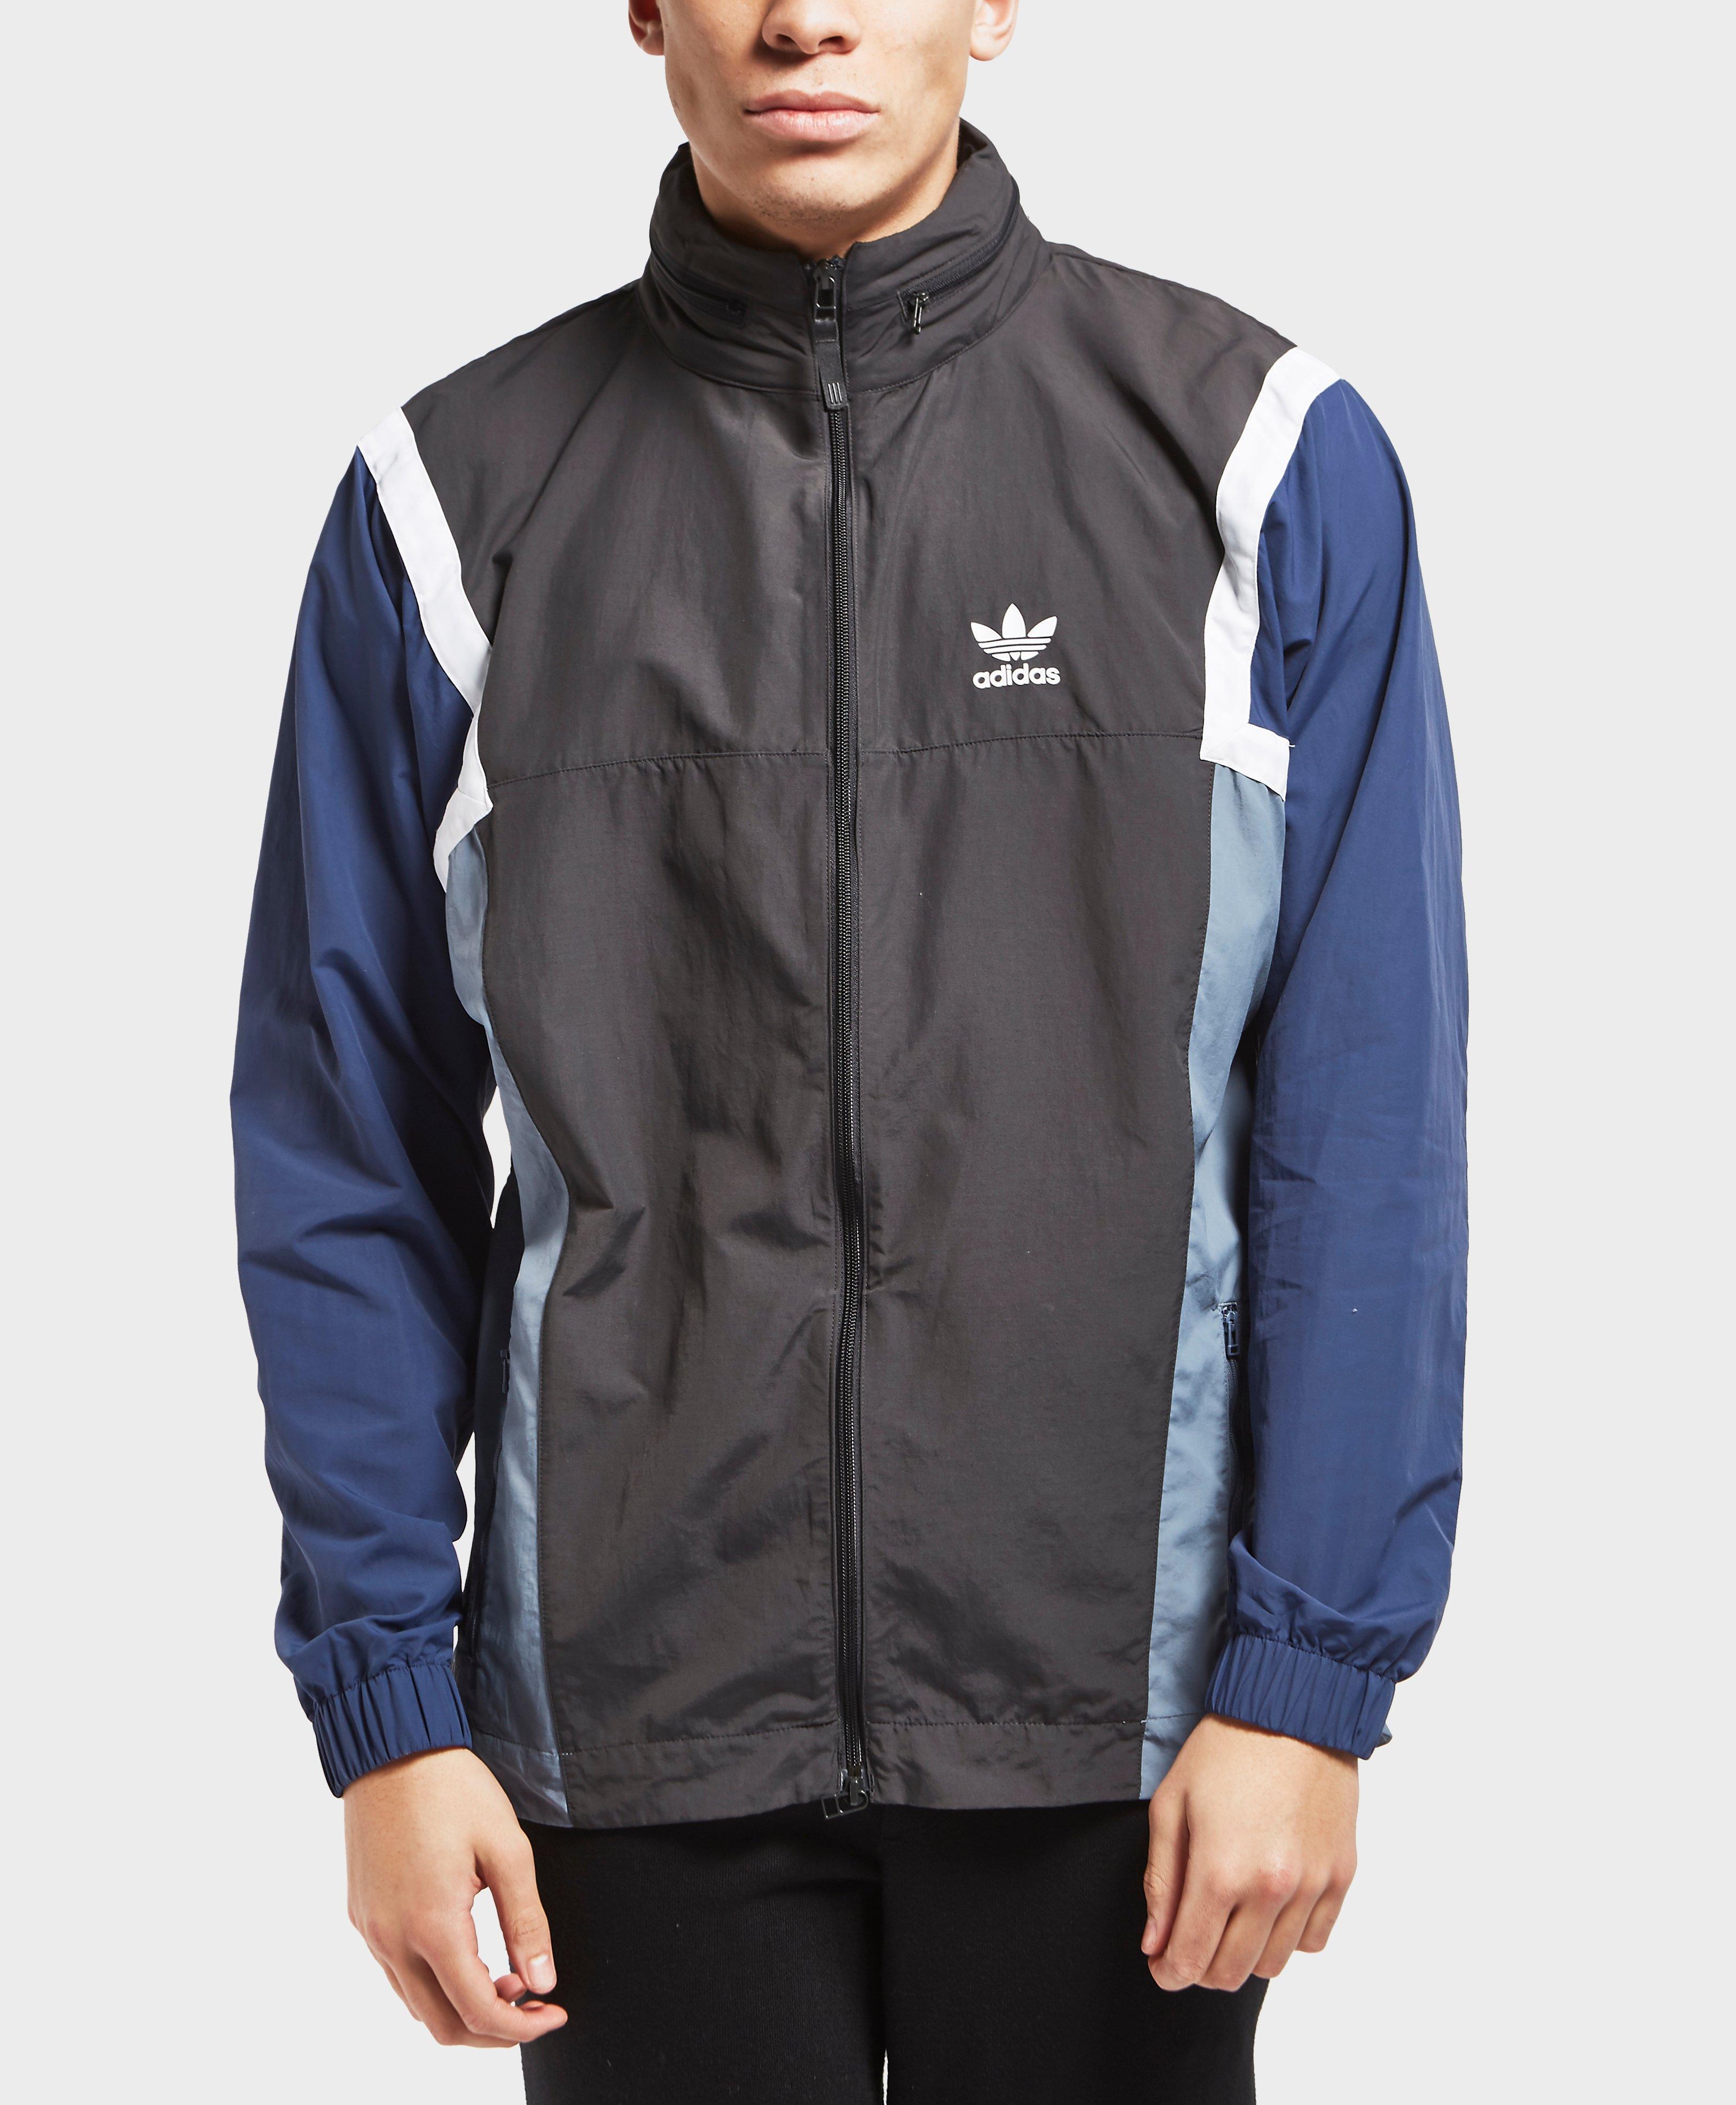 c69832d40b3 adidas Originals Nova Full Zip Lightweight Jacket for Men - Lyst